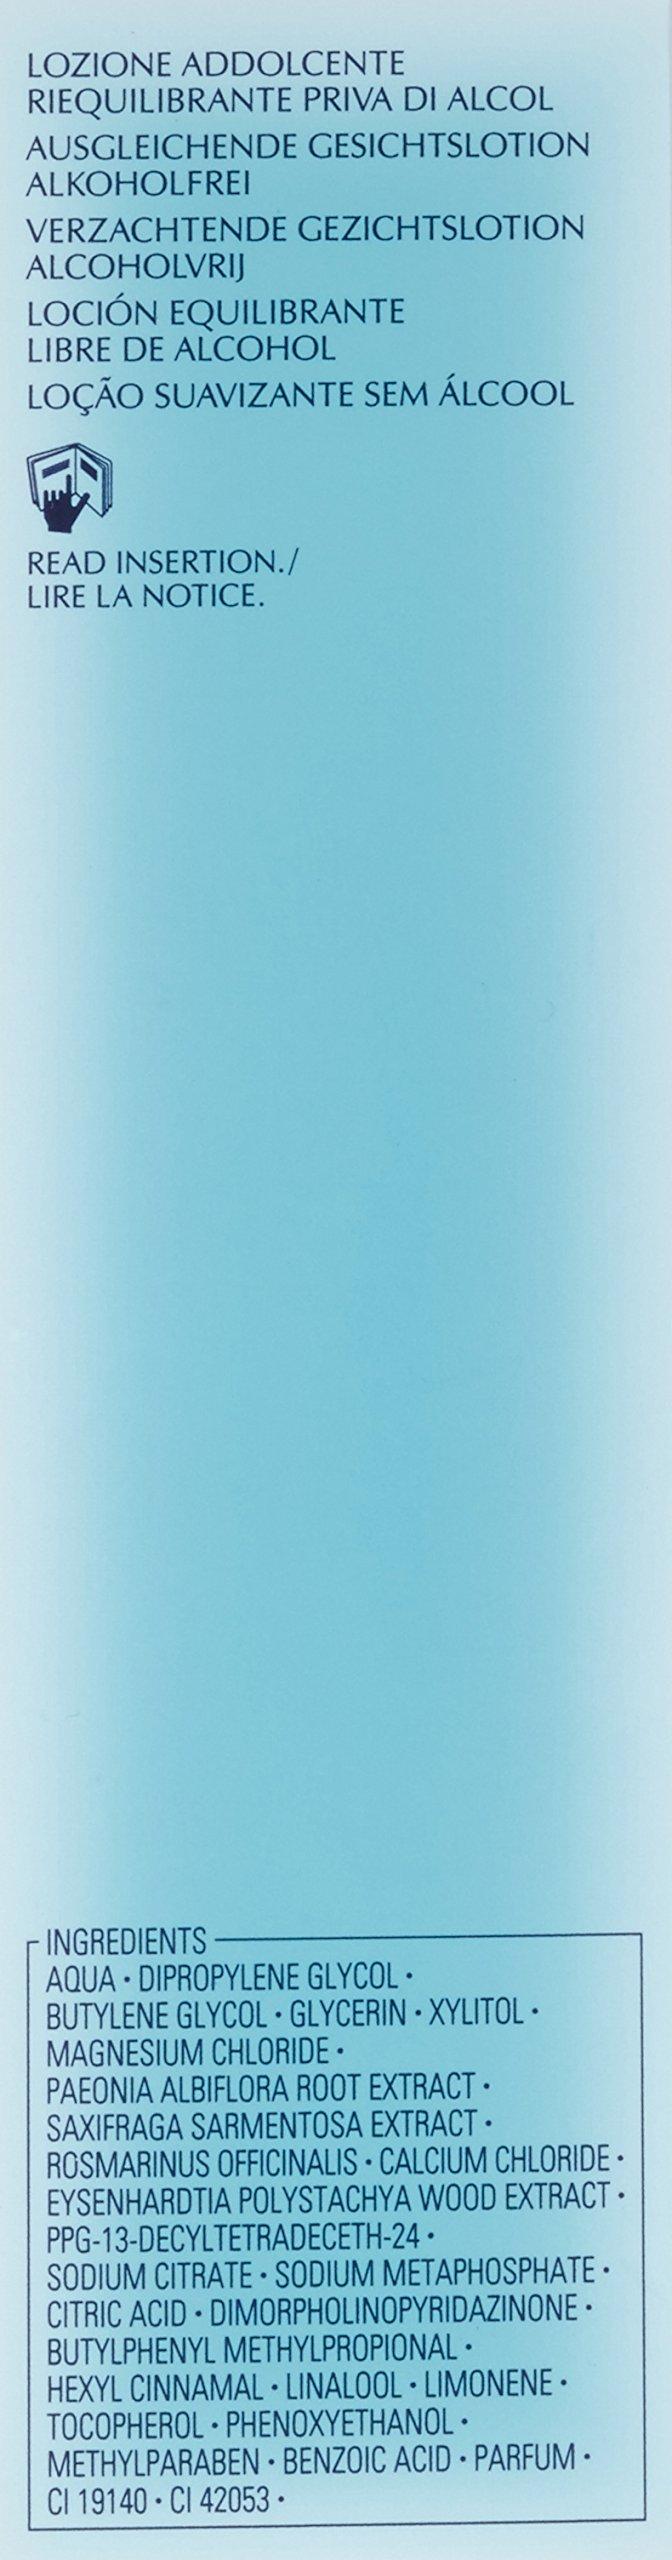 Shiseido Pureness Balancing Softener for Unisex, 5 Ounce by Shiseido (Image #7)